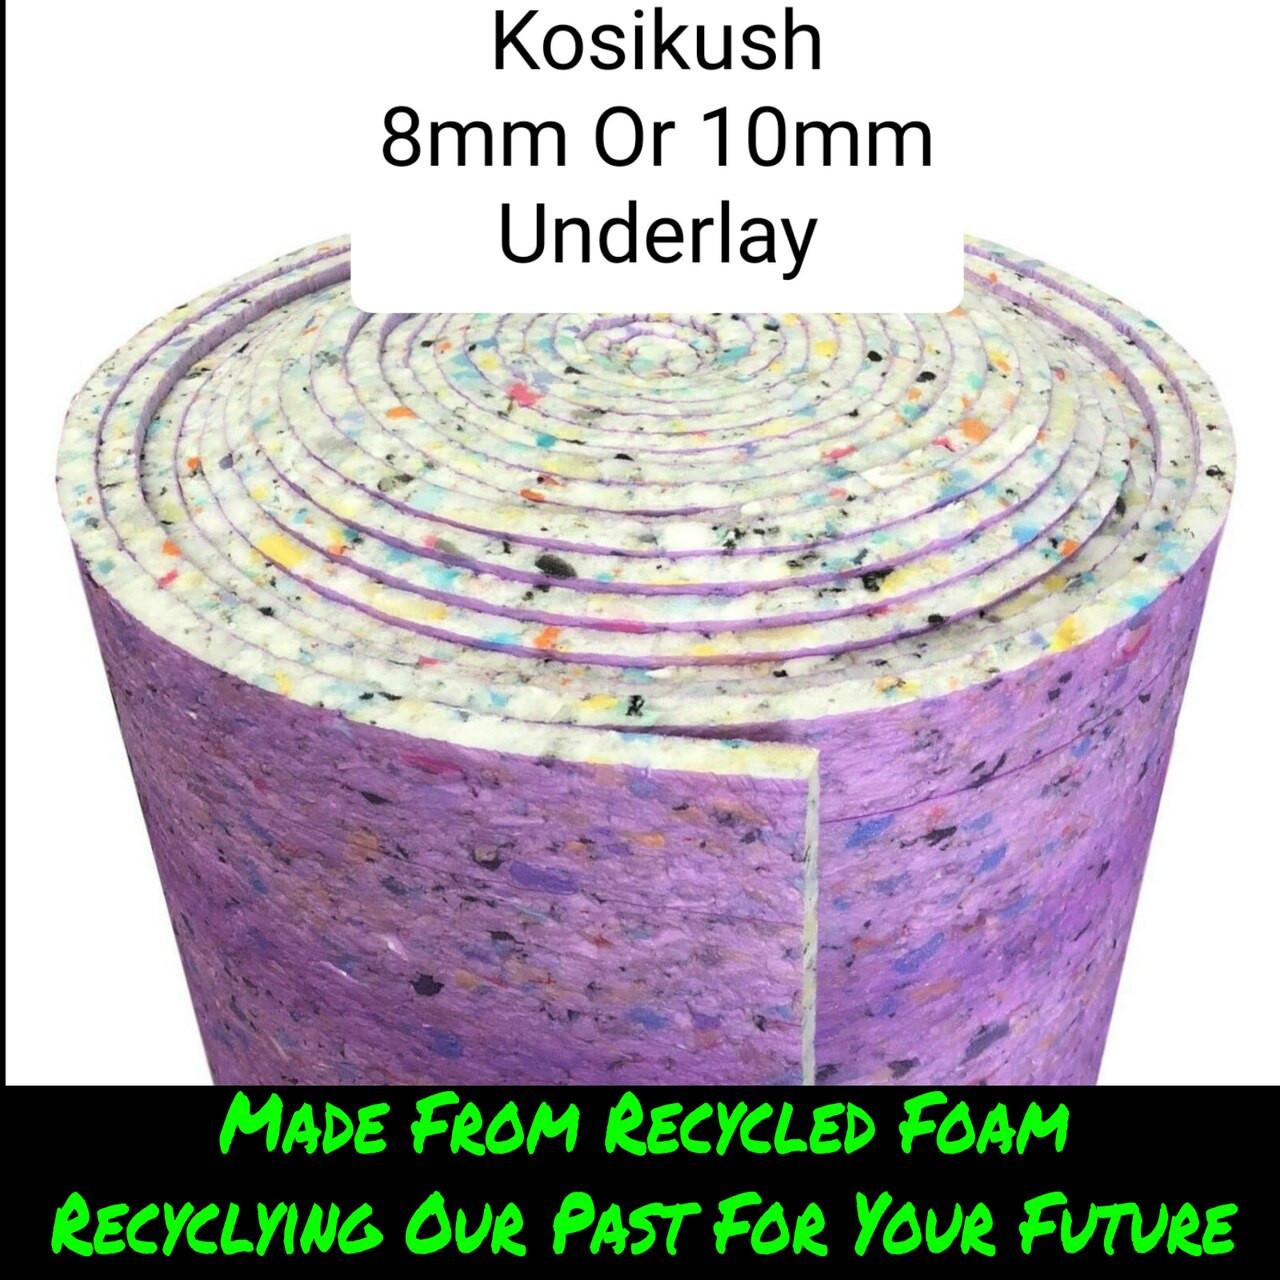 Kosikush Cheap Carpet Interfloor Underlay recycle